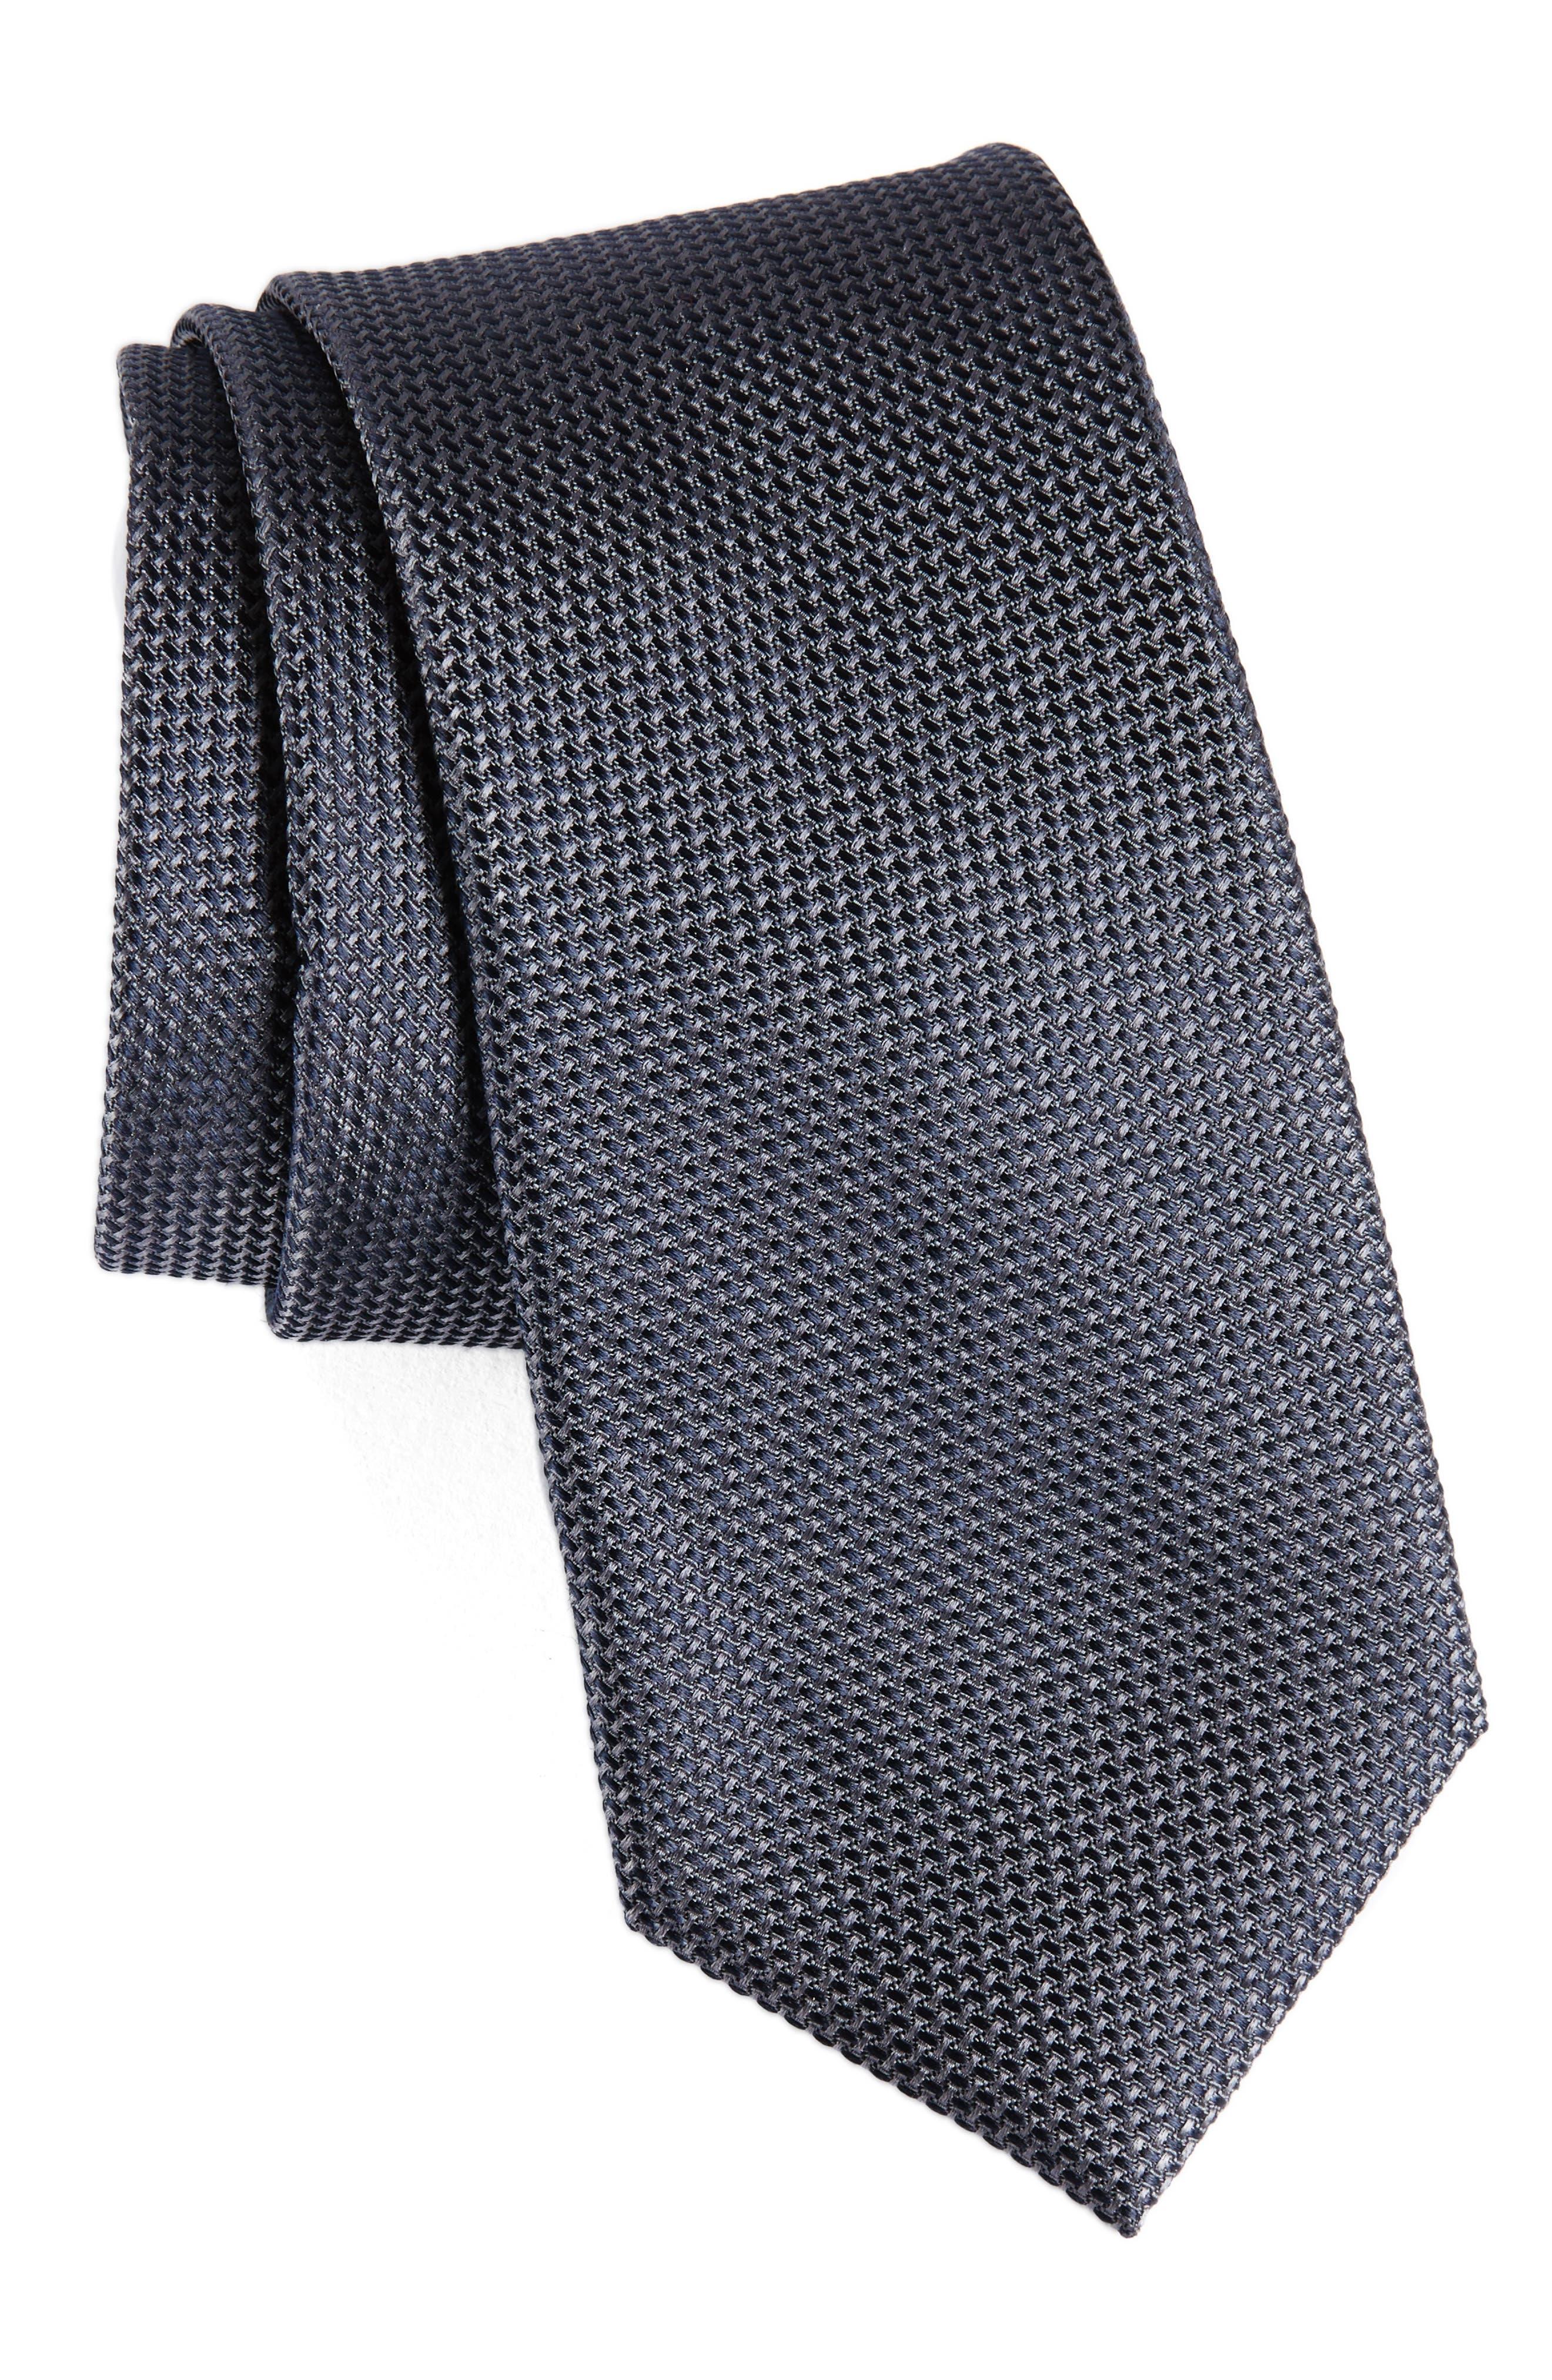 Alternate Image 1 Selected - Nordstrom Men's Shop Solid Silk Tie